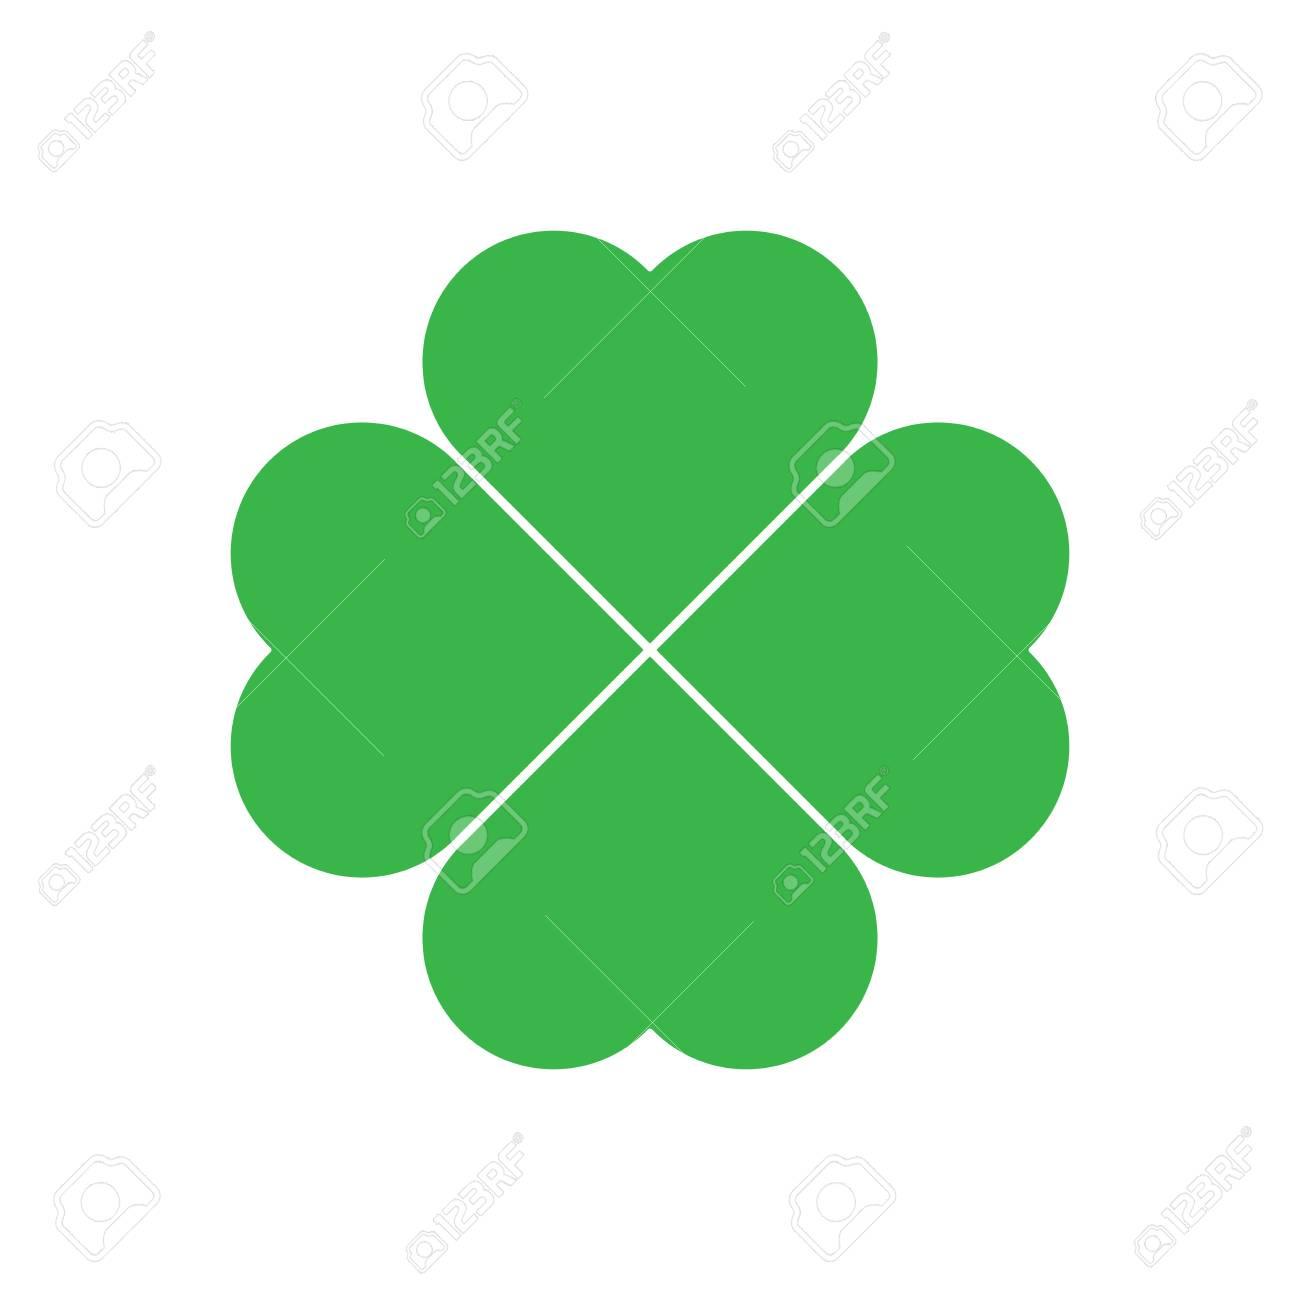 shamrock green four leaf clover icon good luck theme design element simple geometrical